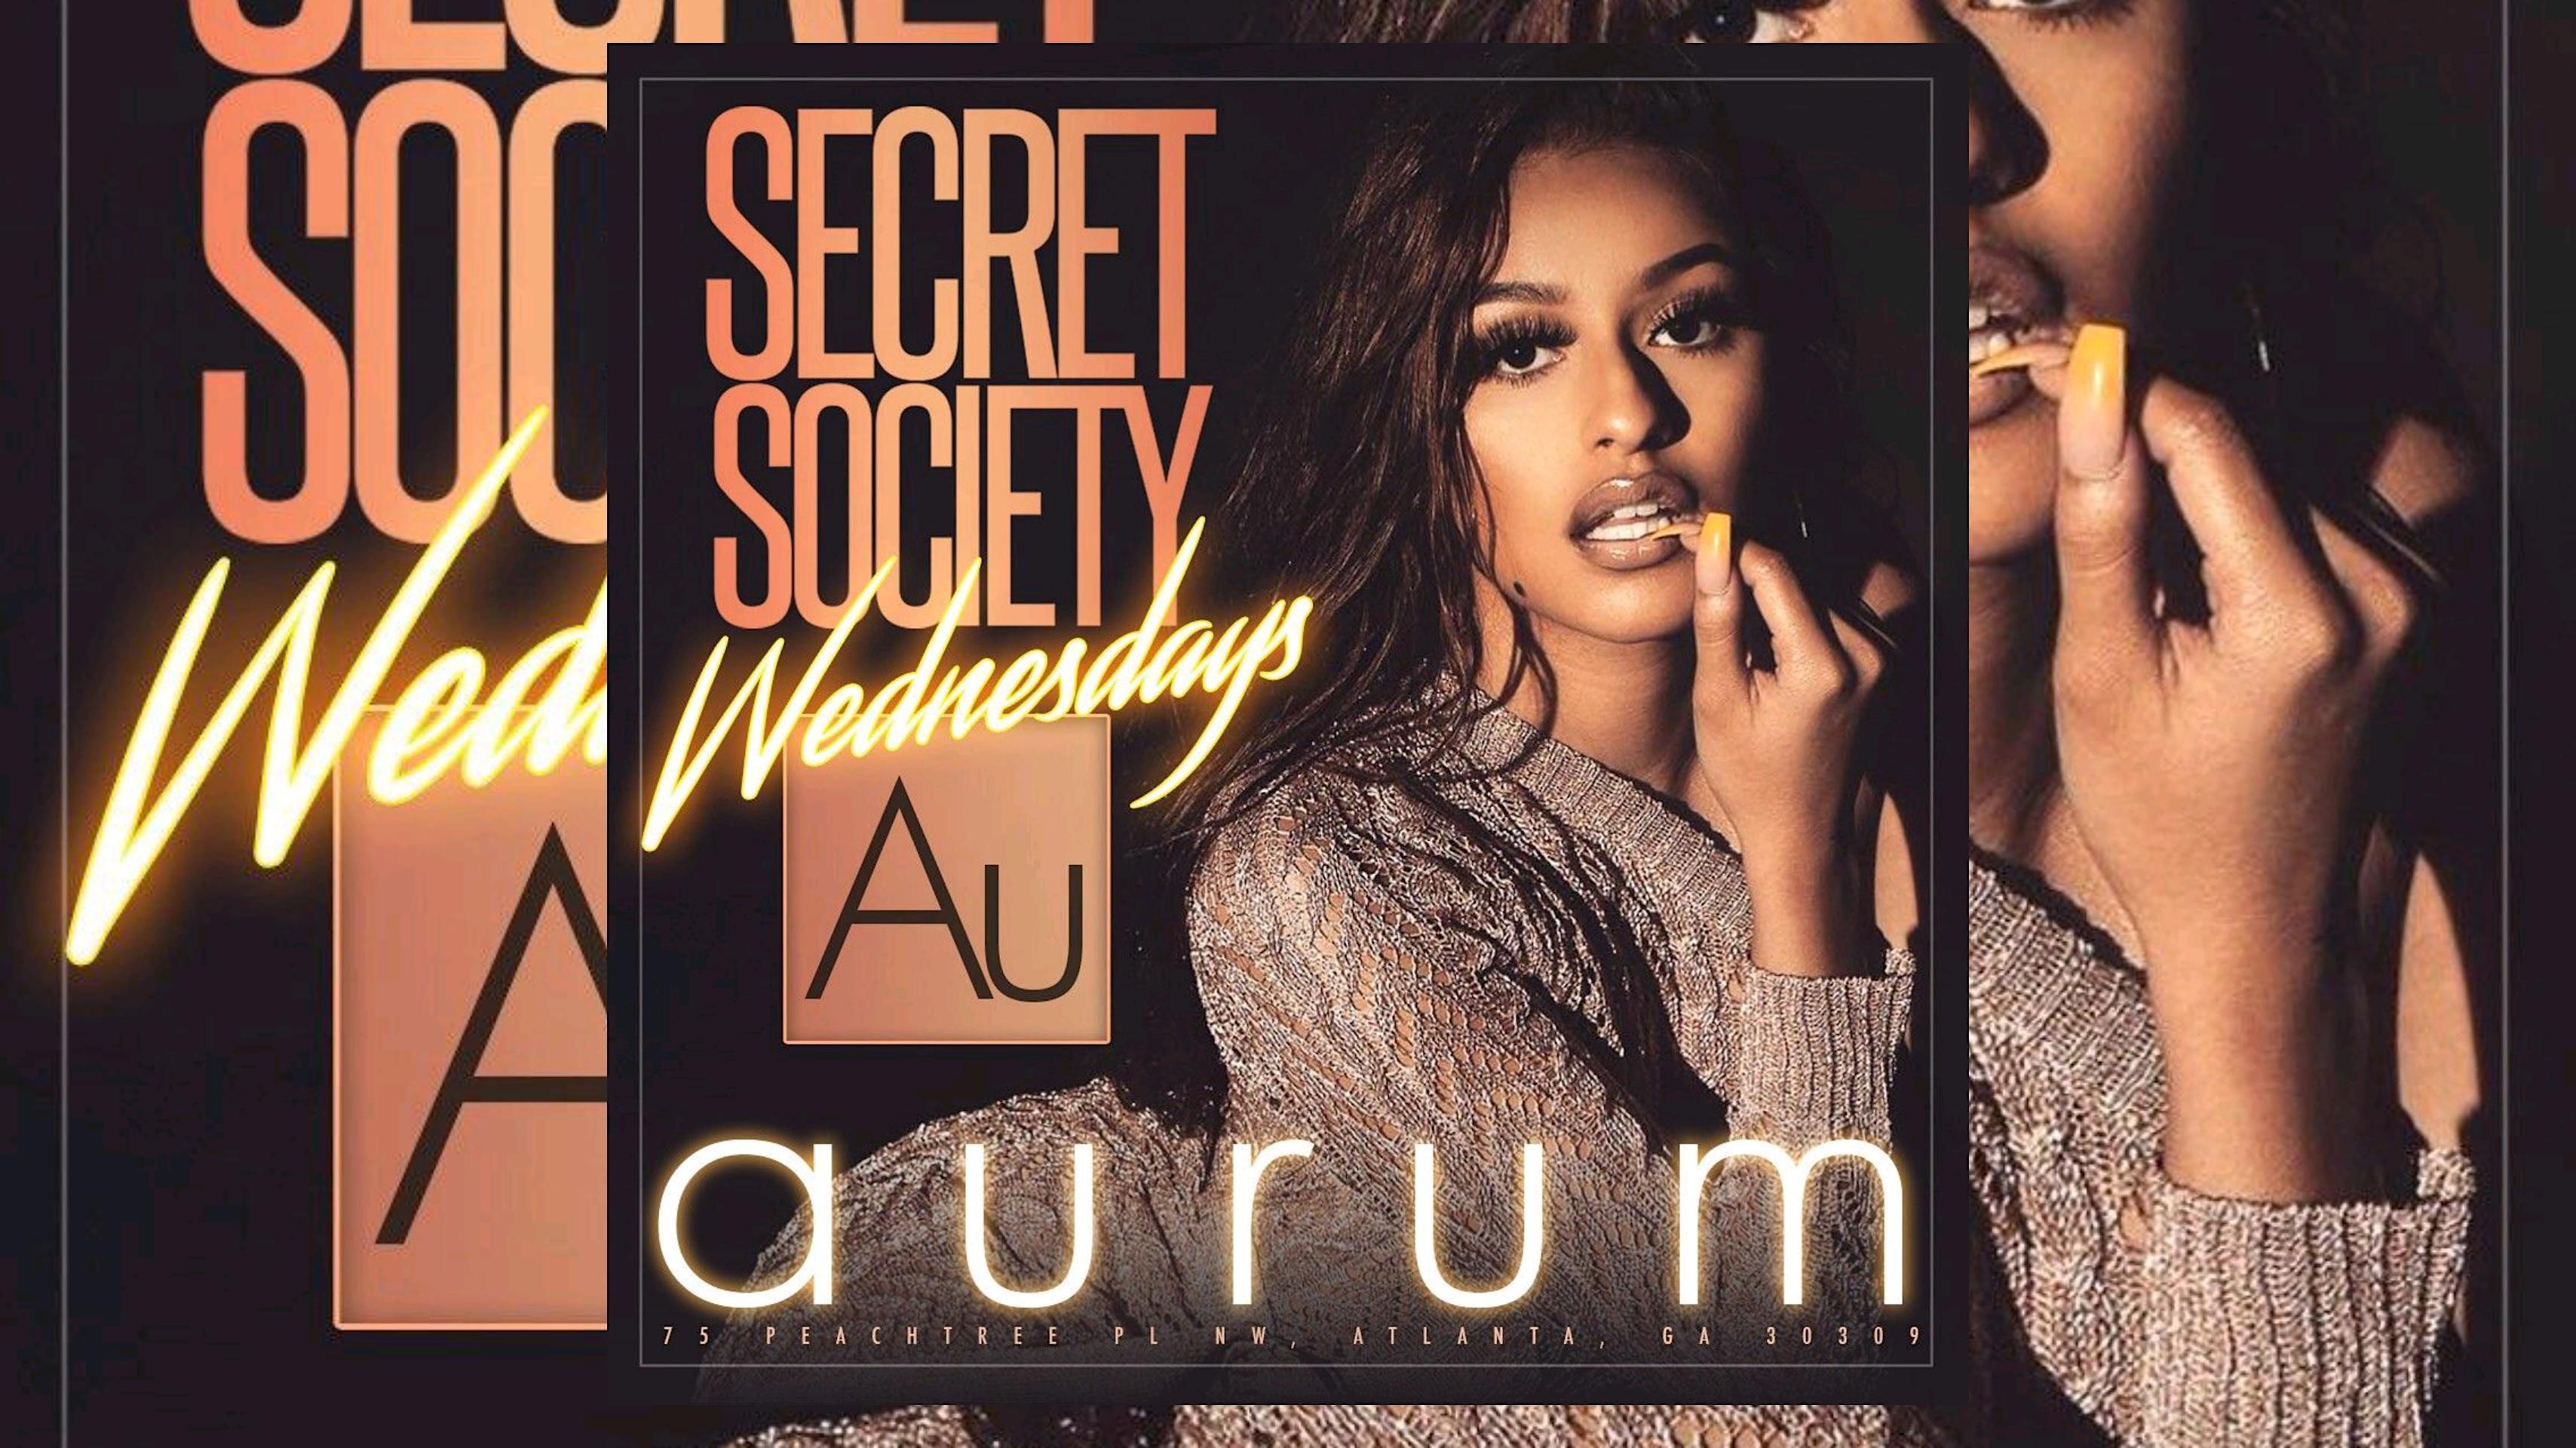 AURUM LOUNGE: Secret Society Wednesdays...Enter FREE with RSVP